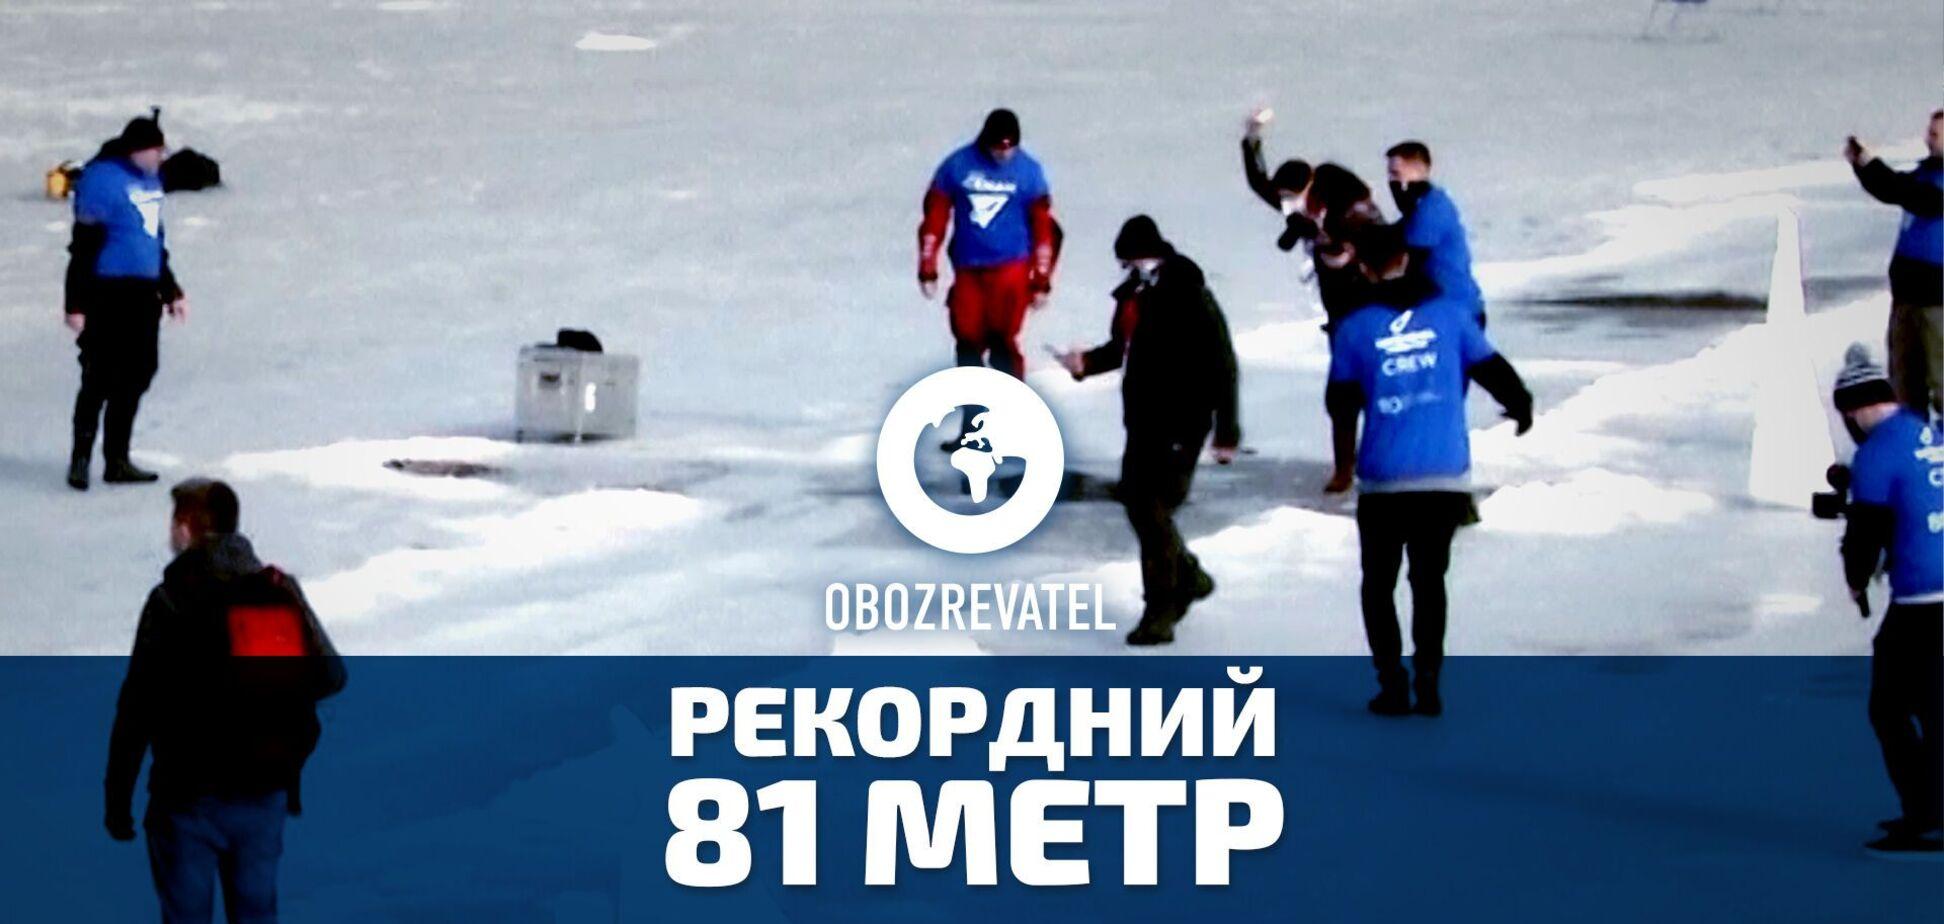 Чешский спортсмен проплыл 81 метр подо льдом и установил рекорд